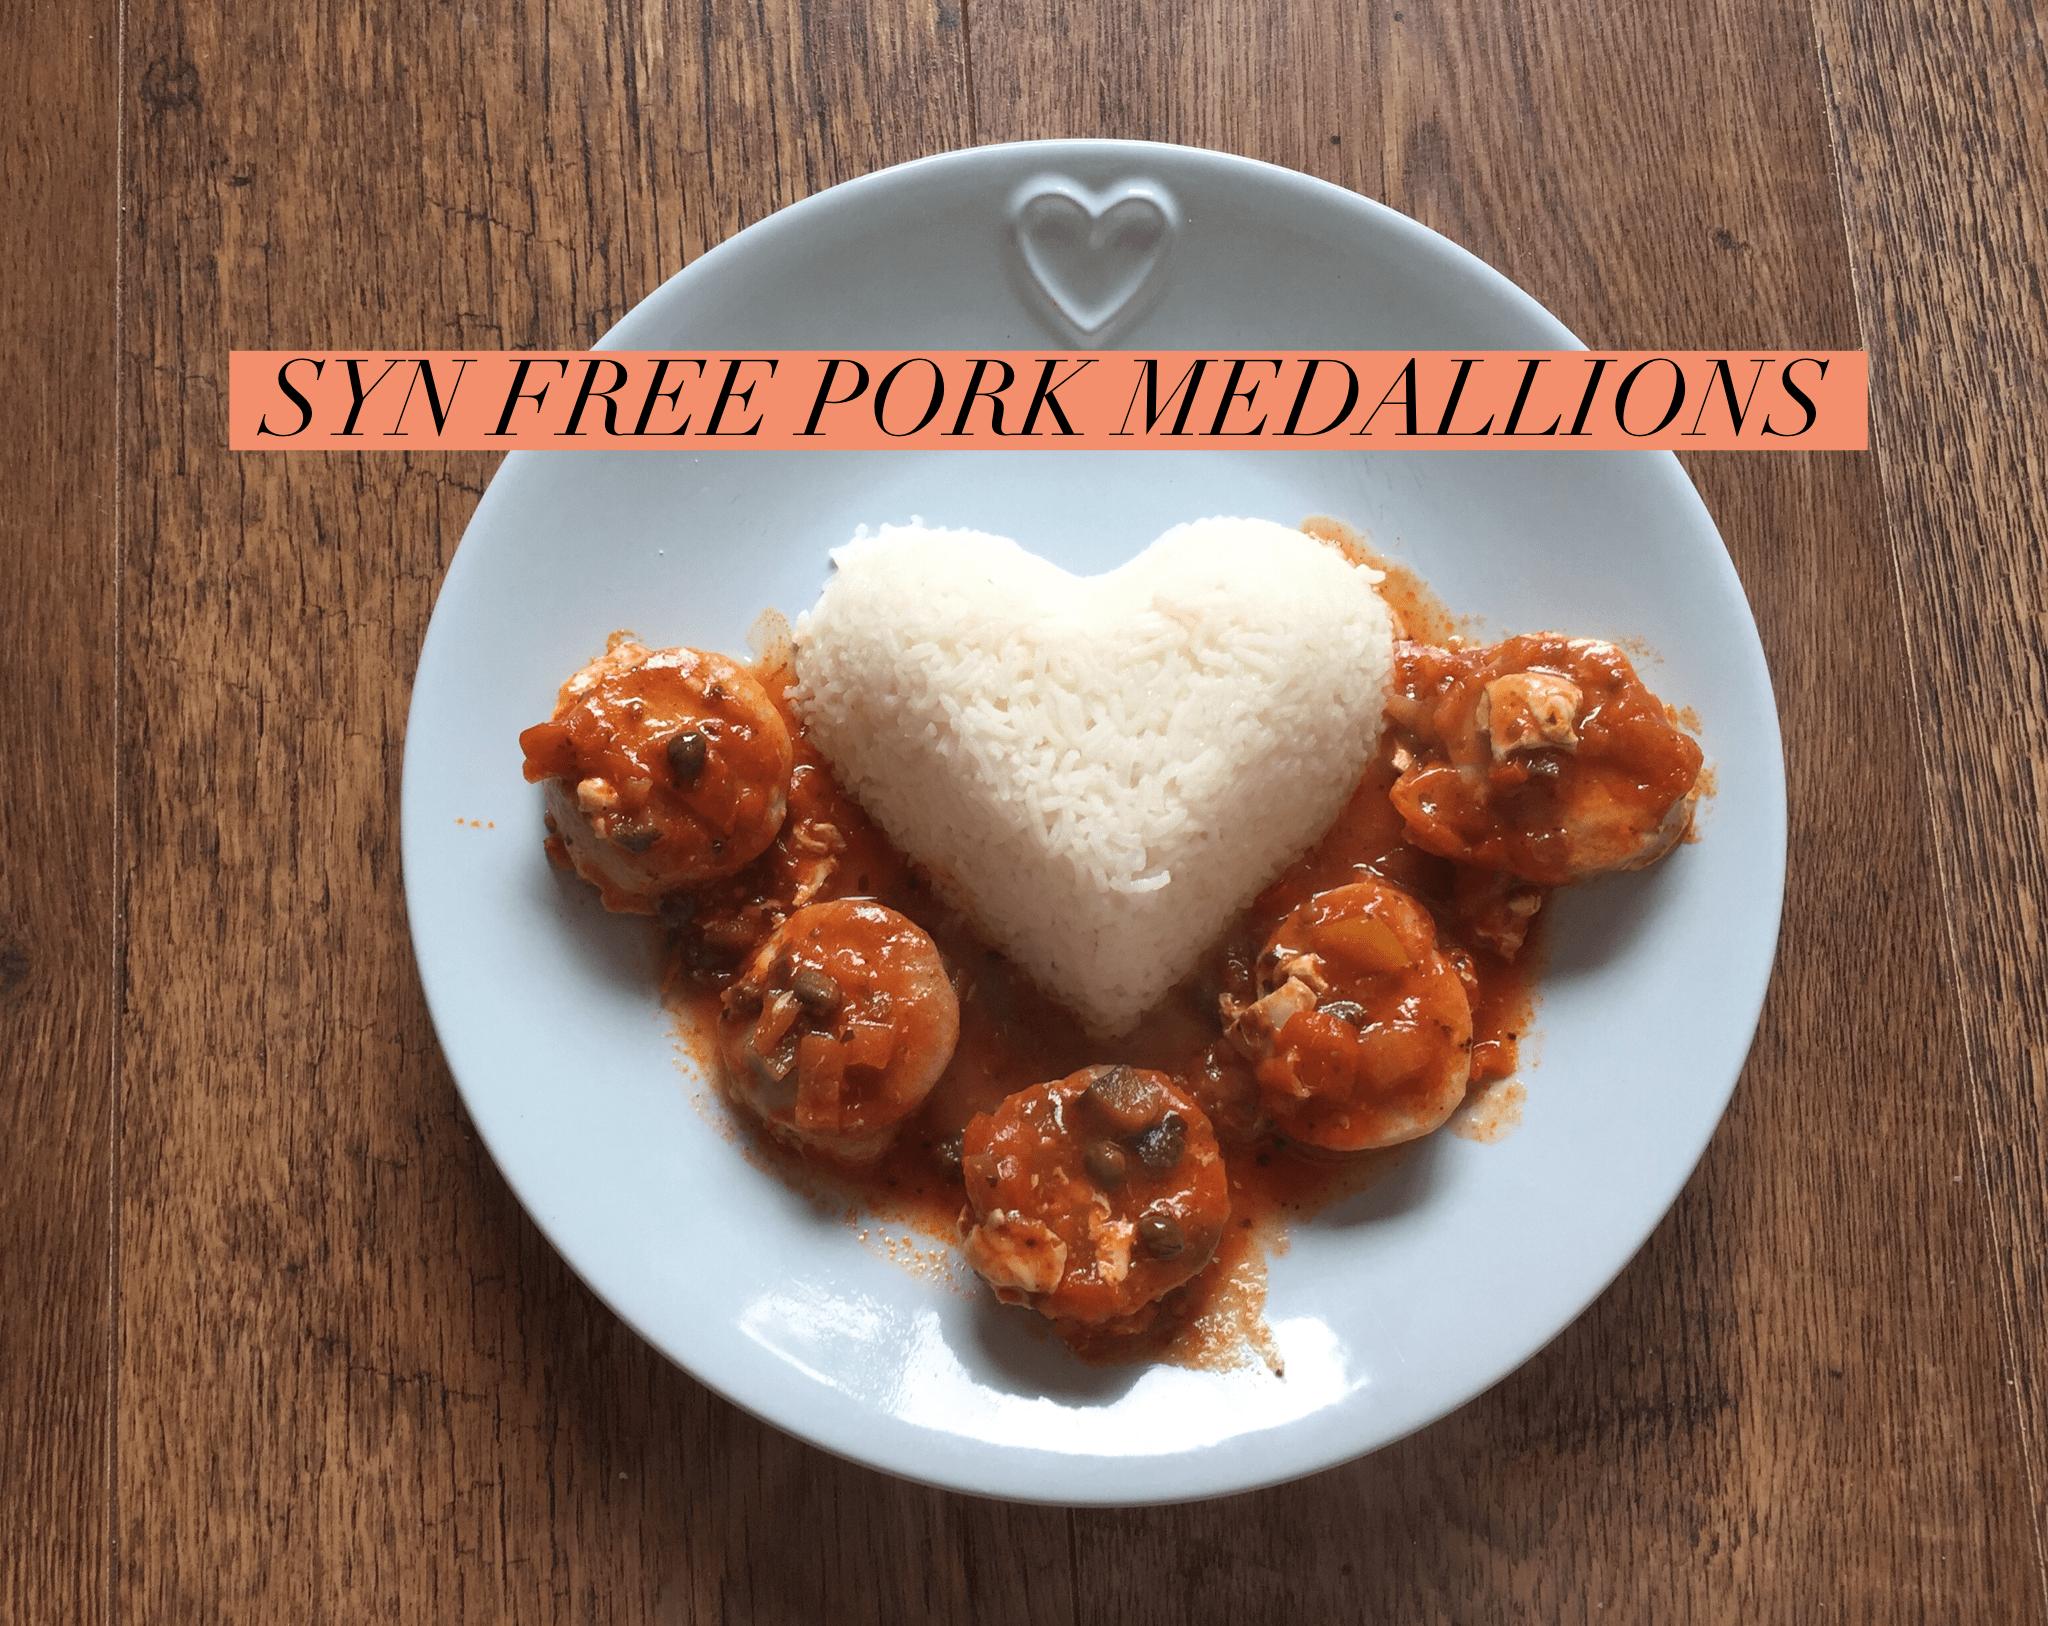 syn free pork medallions